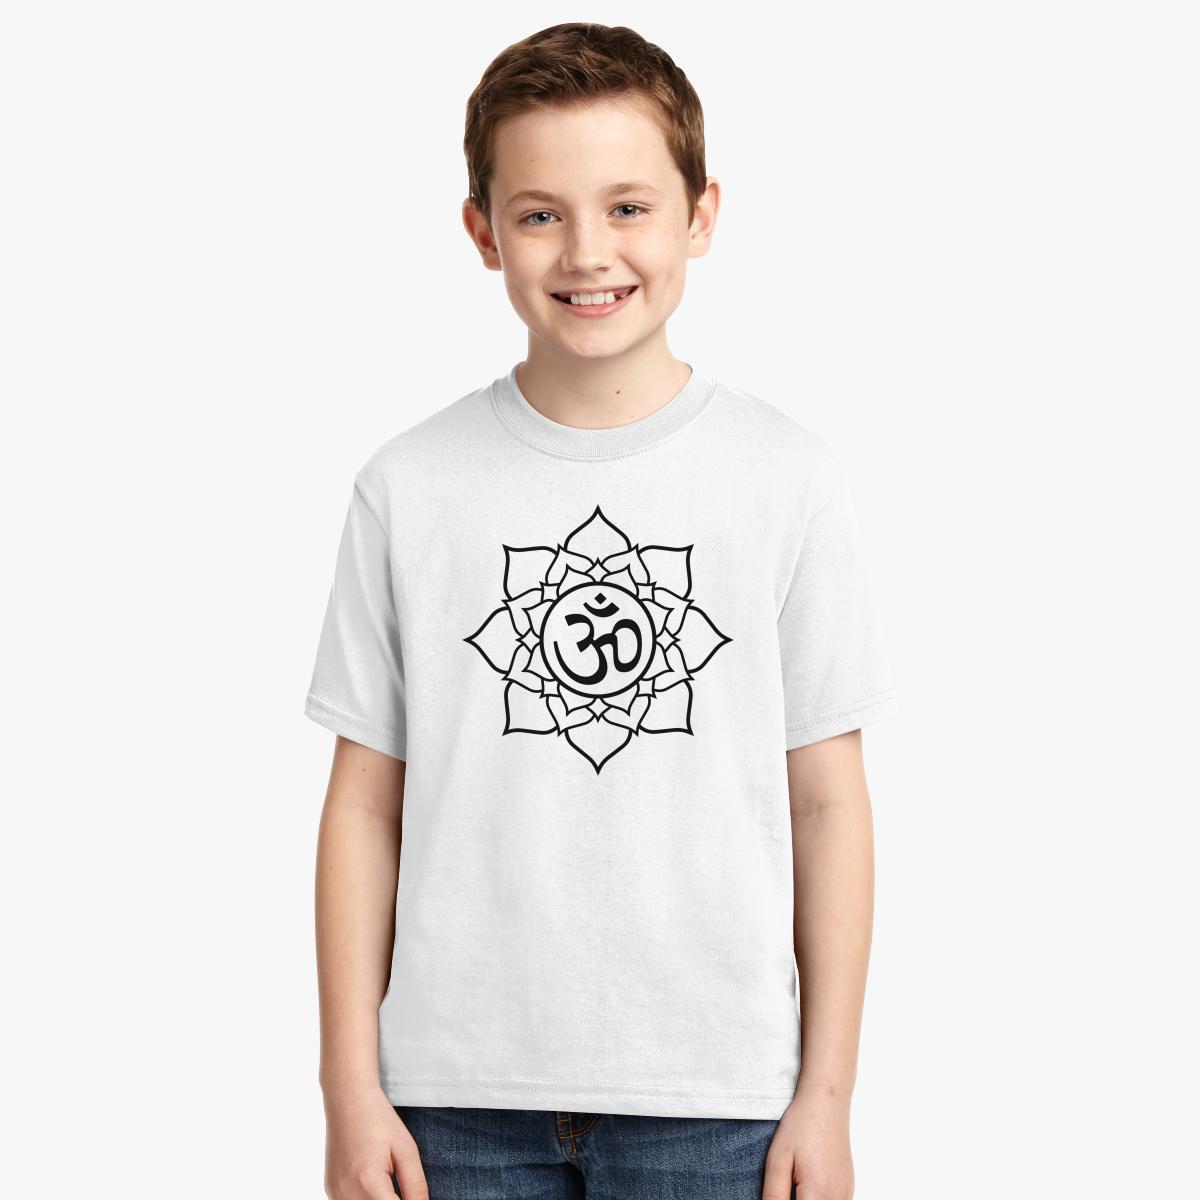 Om lotus flower youth t shirt customon om lotus flower youth t shirt izmirmasajfo